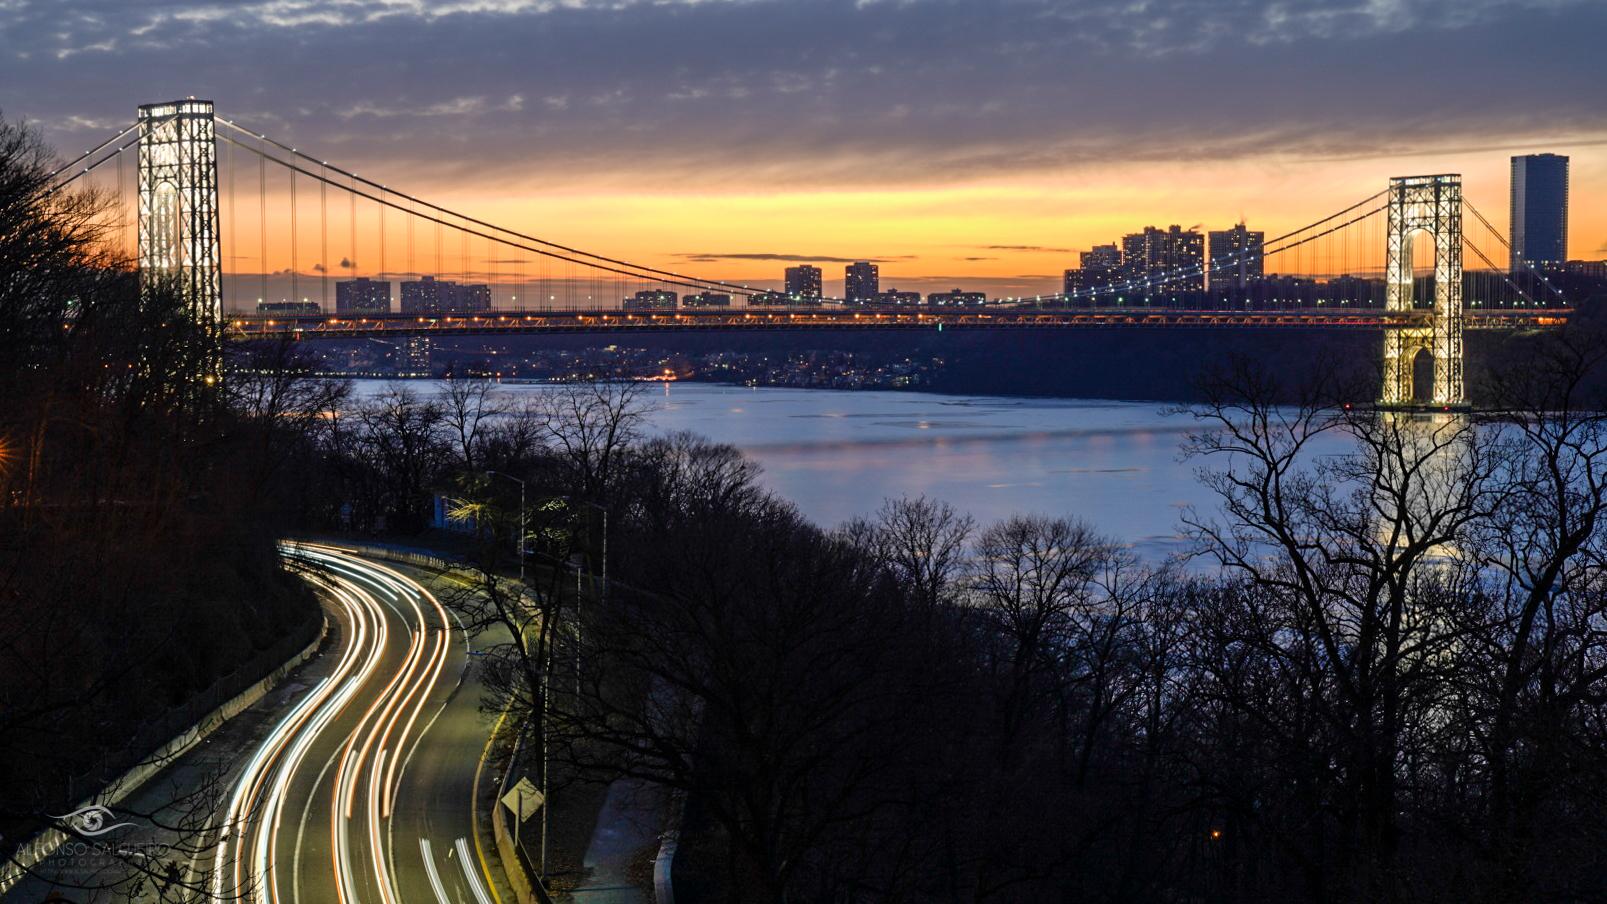 George Washigton bridge at dusk.jpg